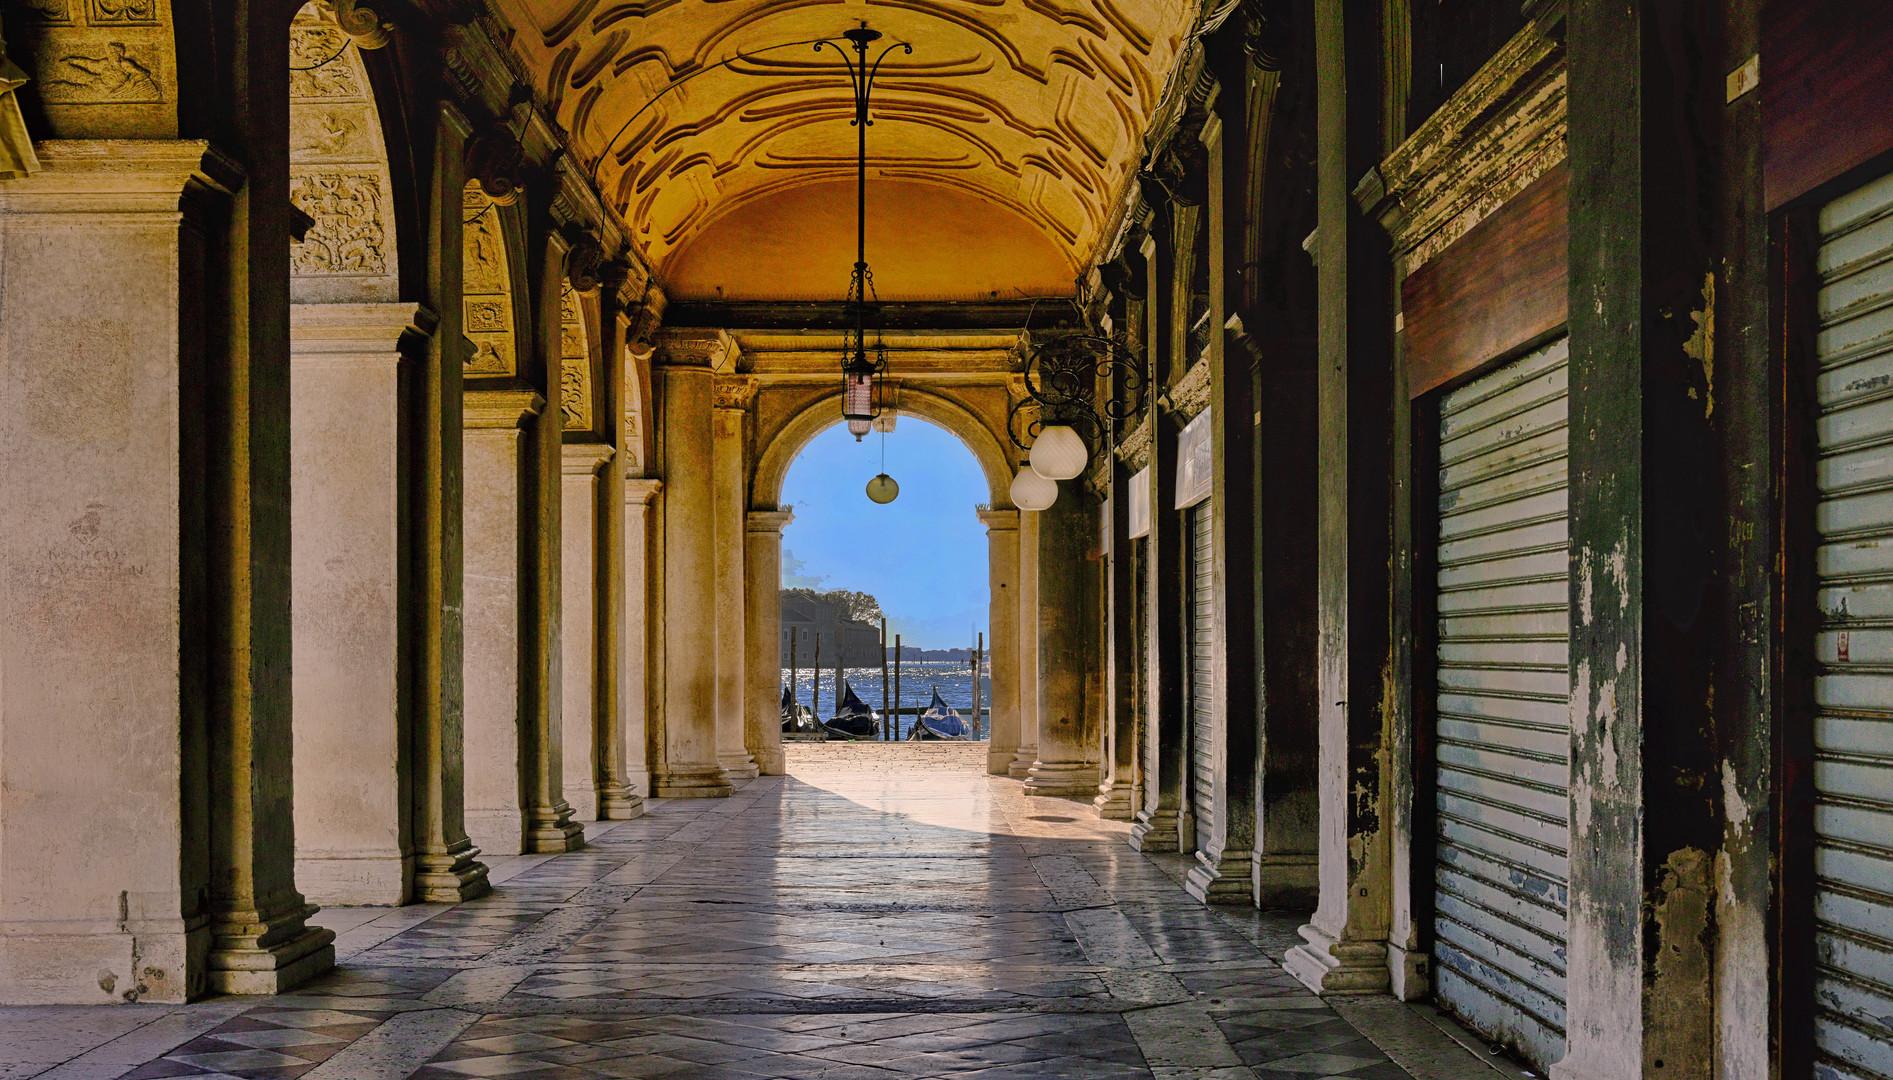 Venedig November 2020 - Durchblick -